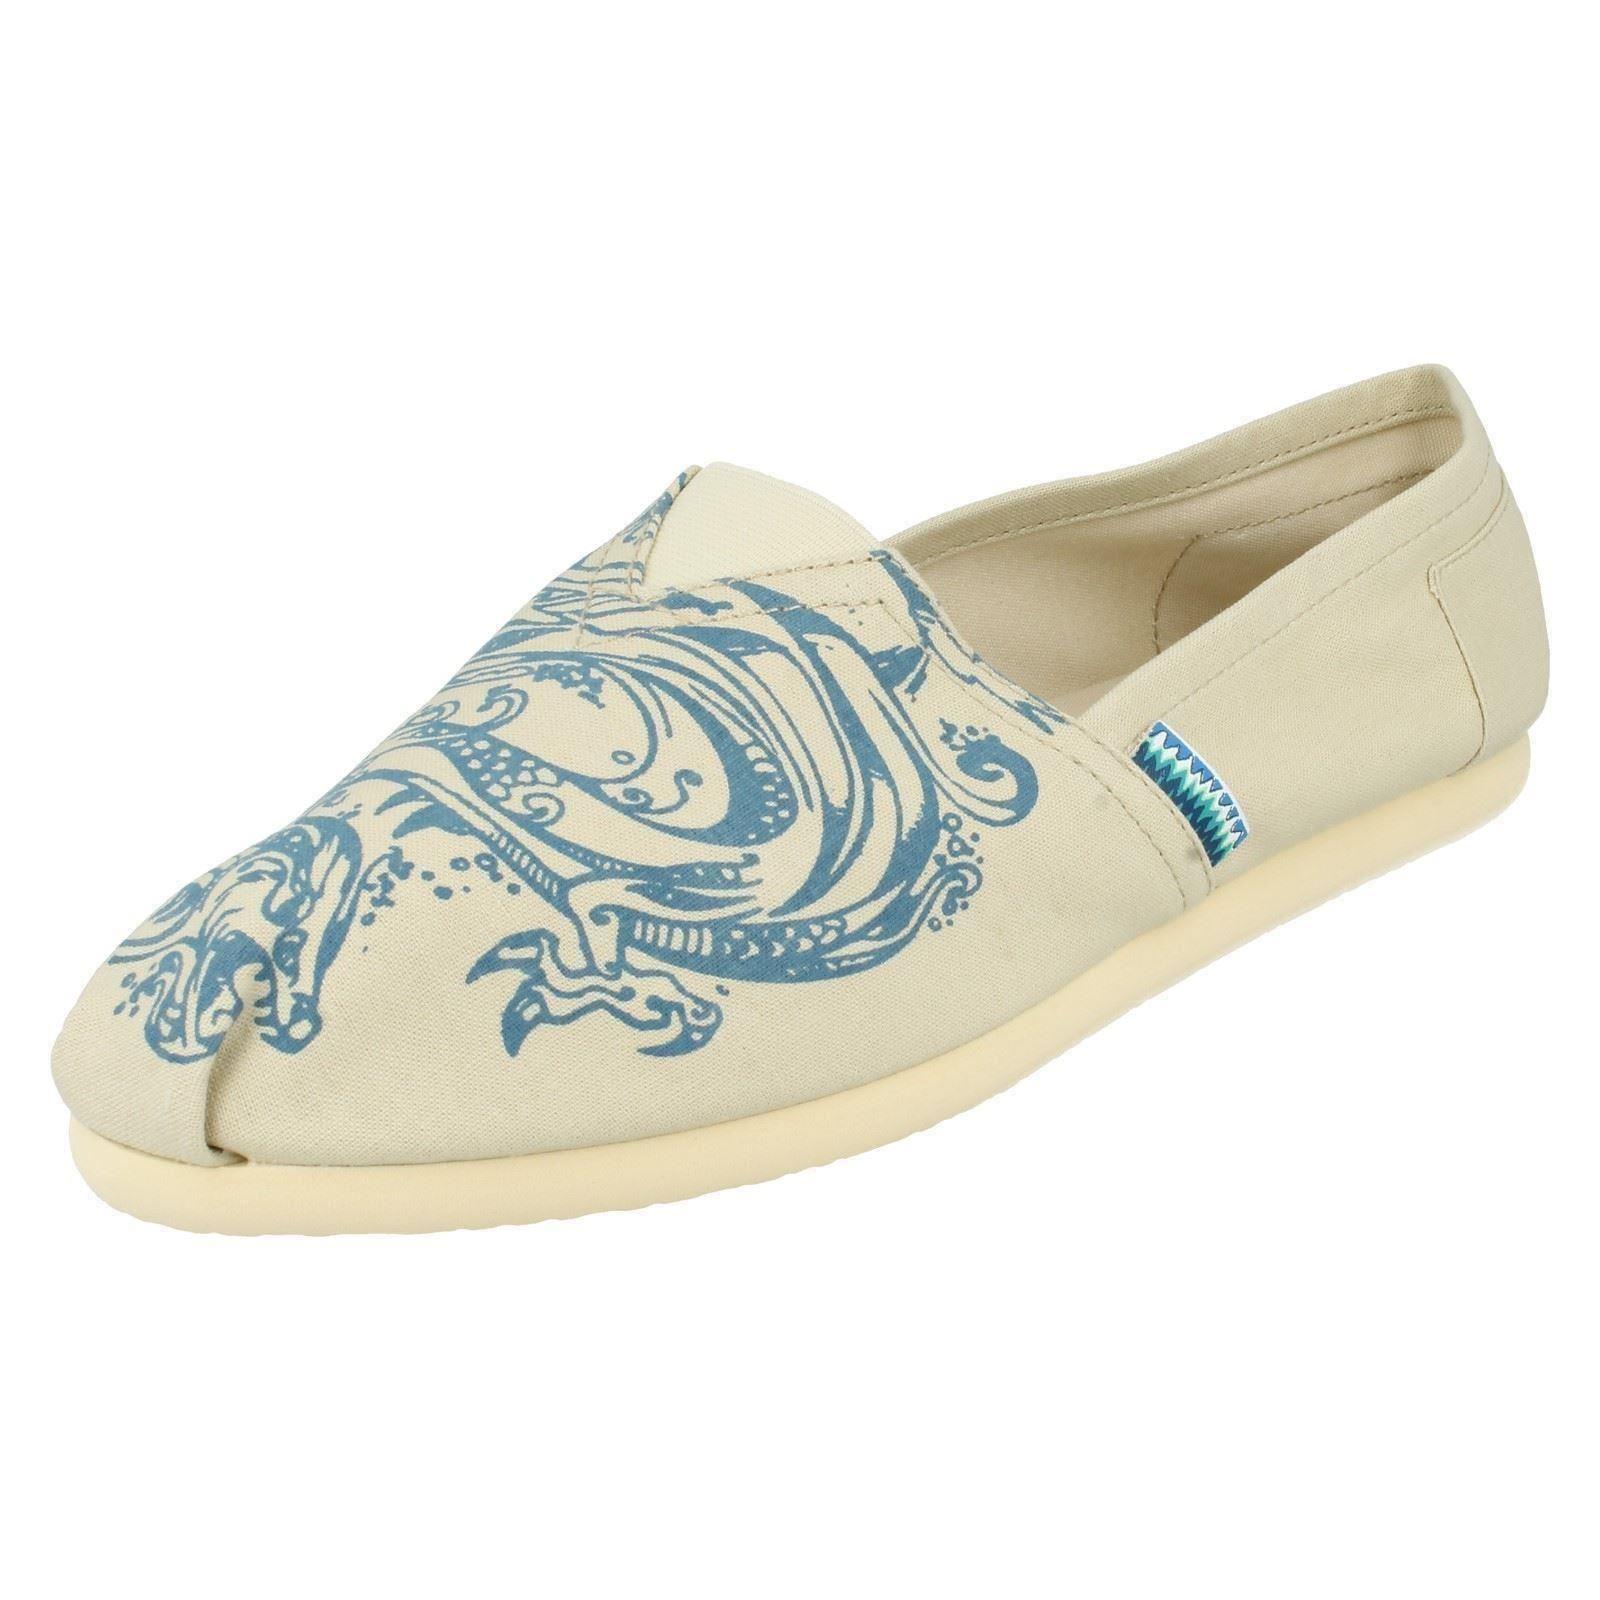 Para Hombre Punto En Lona Zapatos A1073